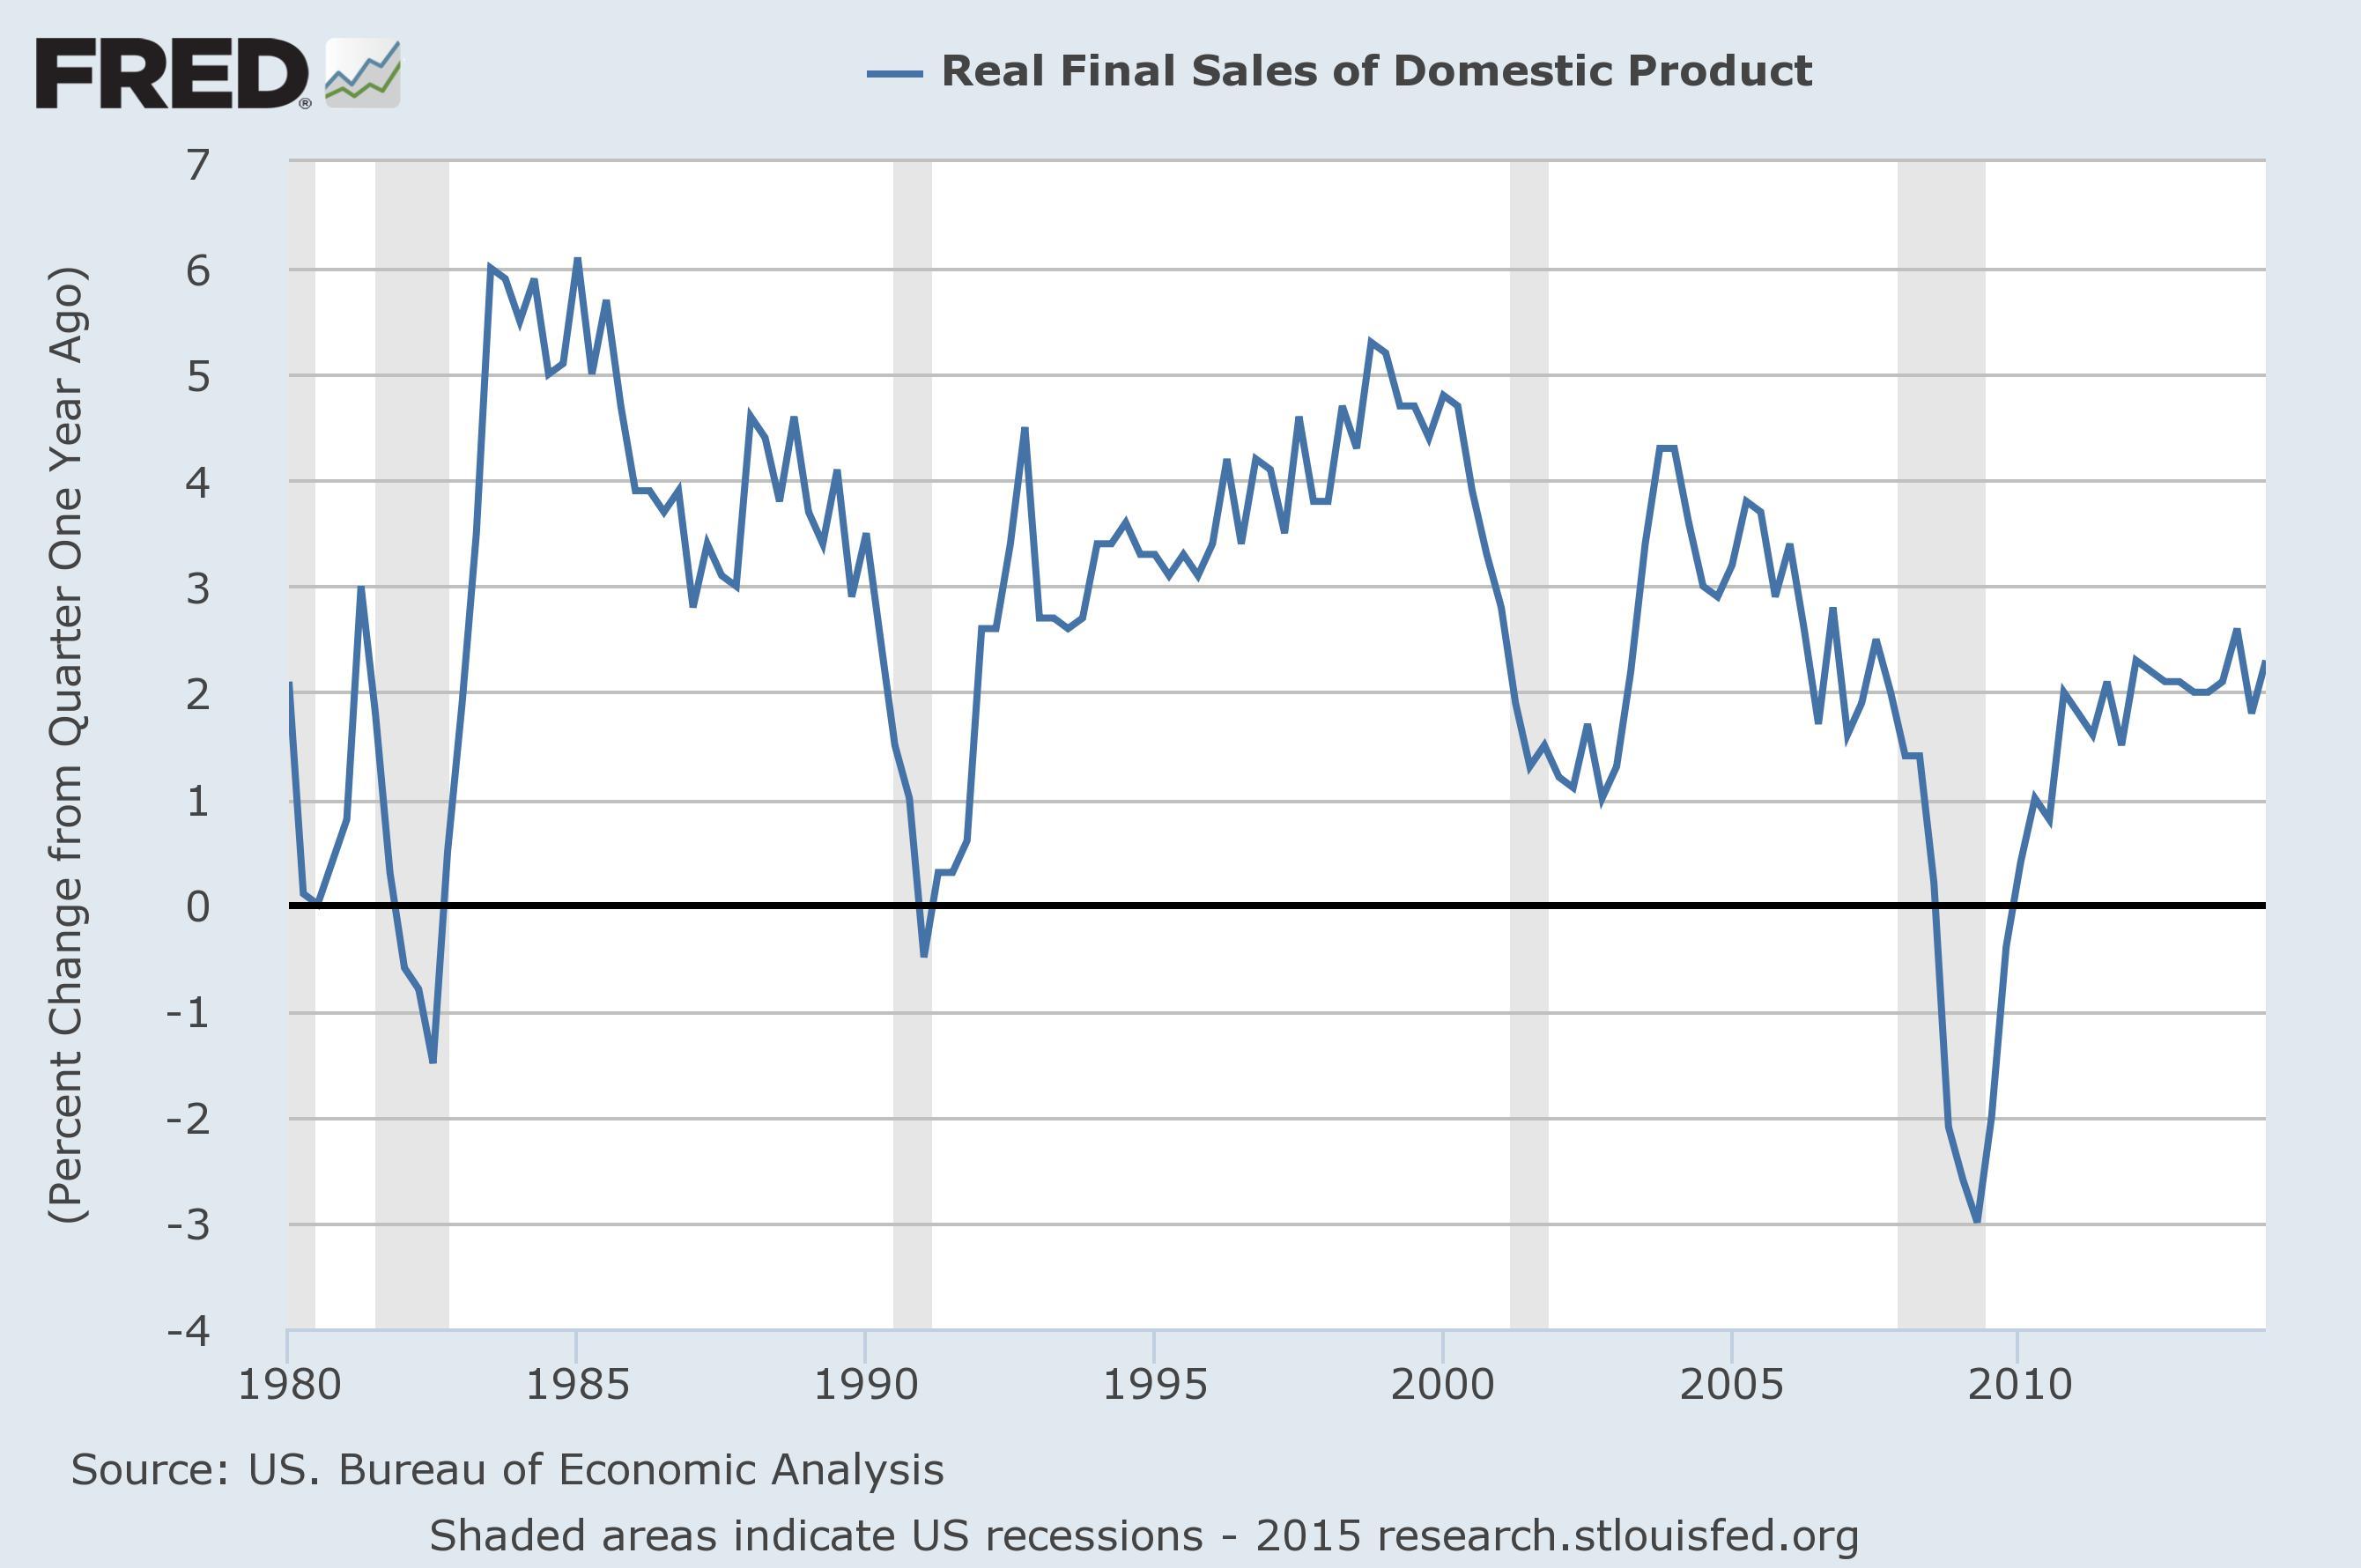 Core GDP